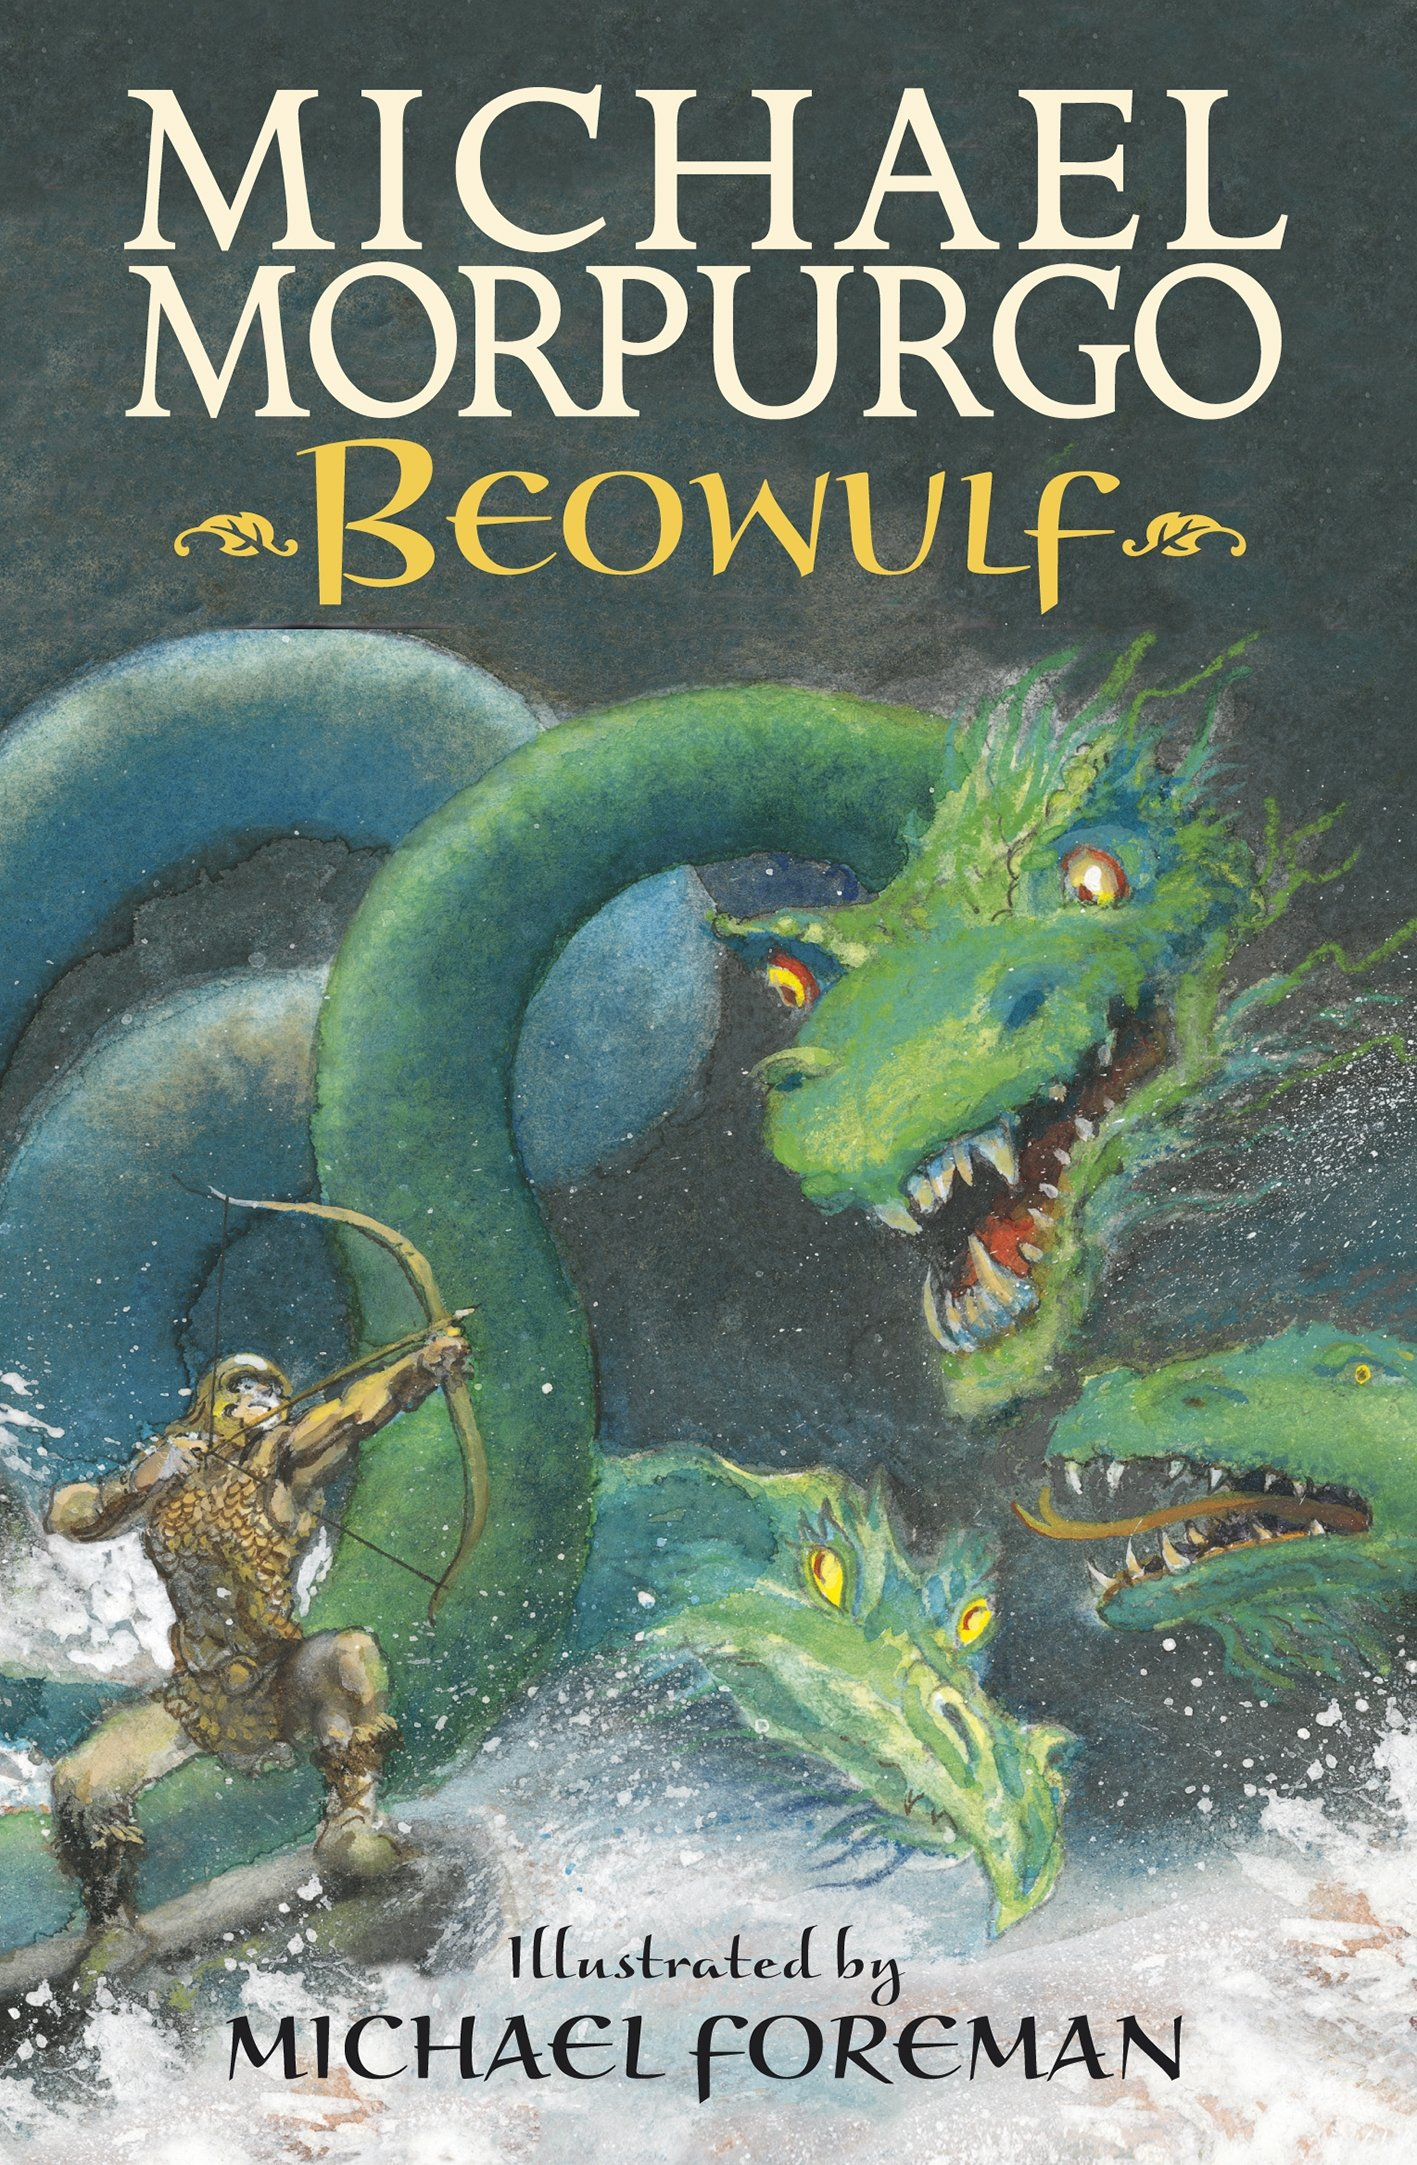 Beowulf: 1: Amazon.co.uk: Morpurgo, Sir Michael, Foreman, Michael:  9781406348873: Books